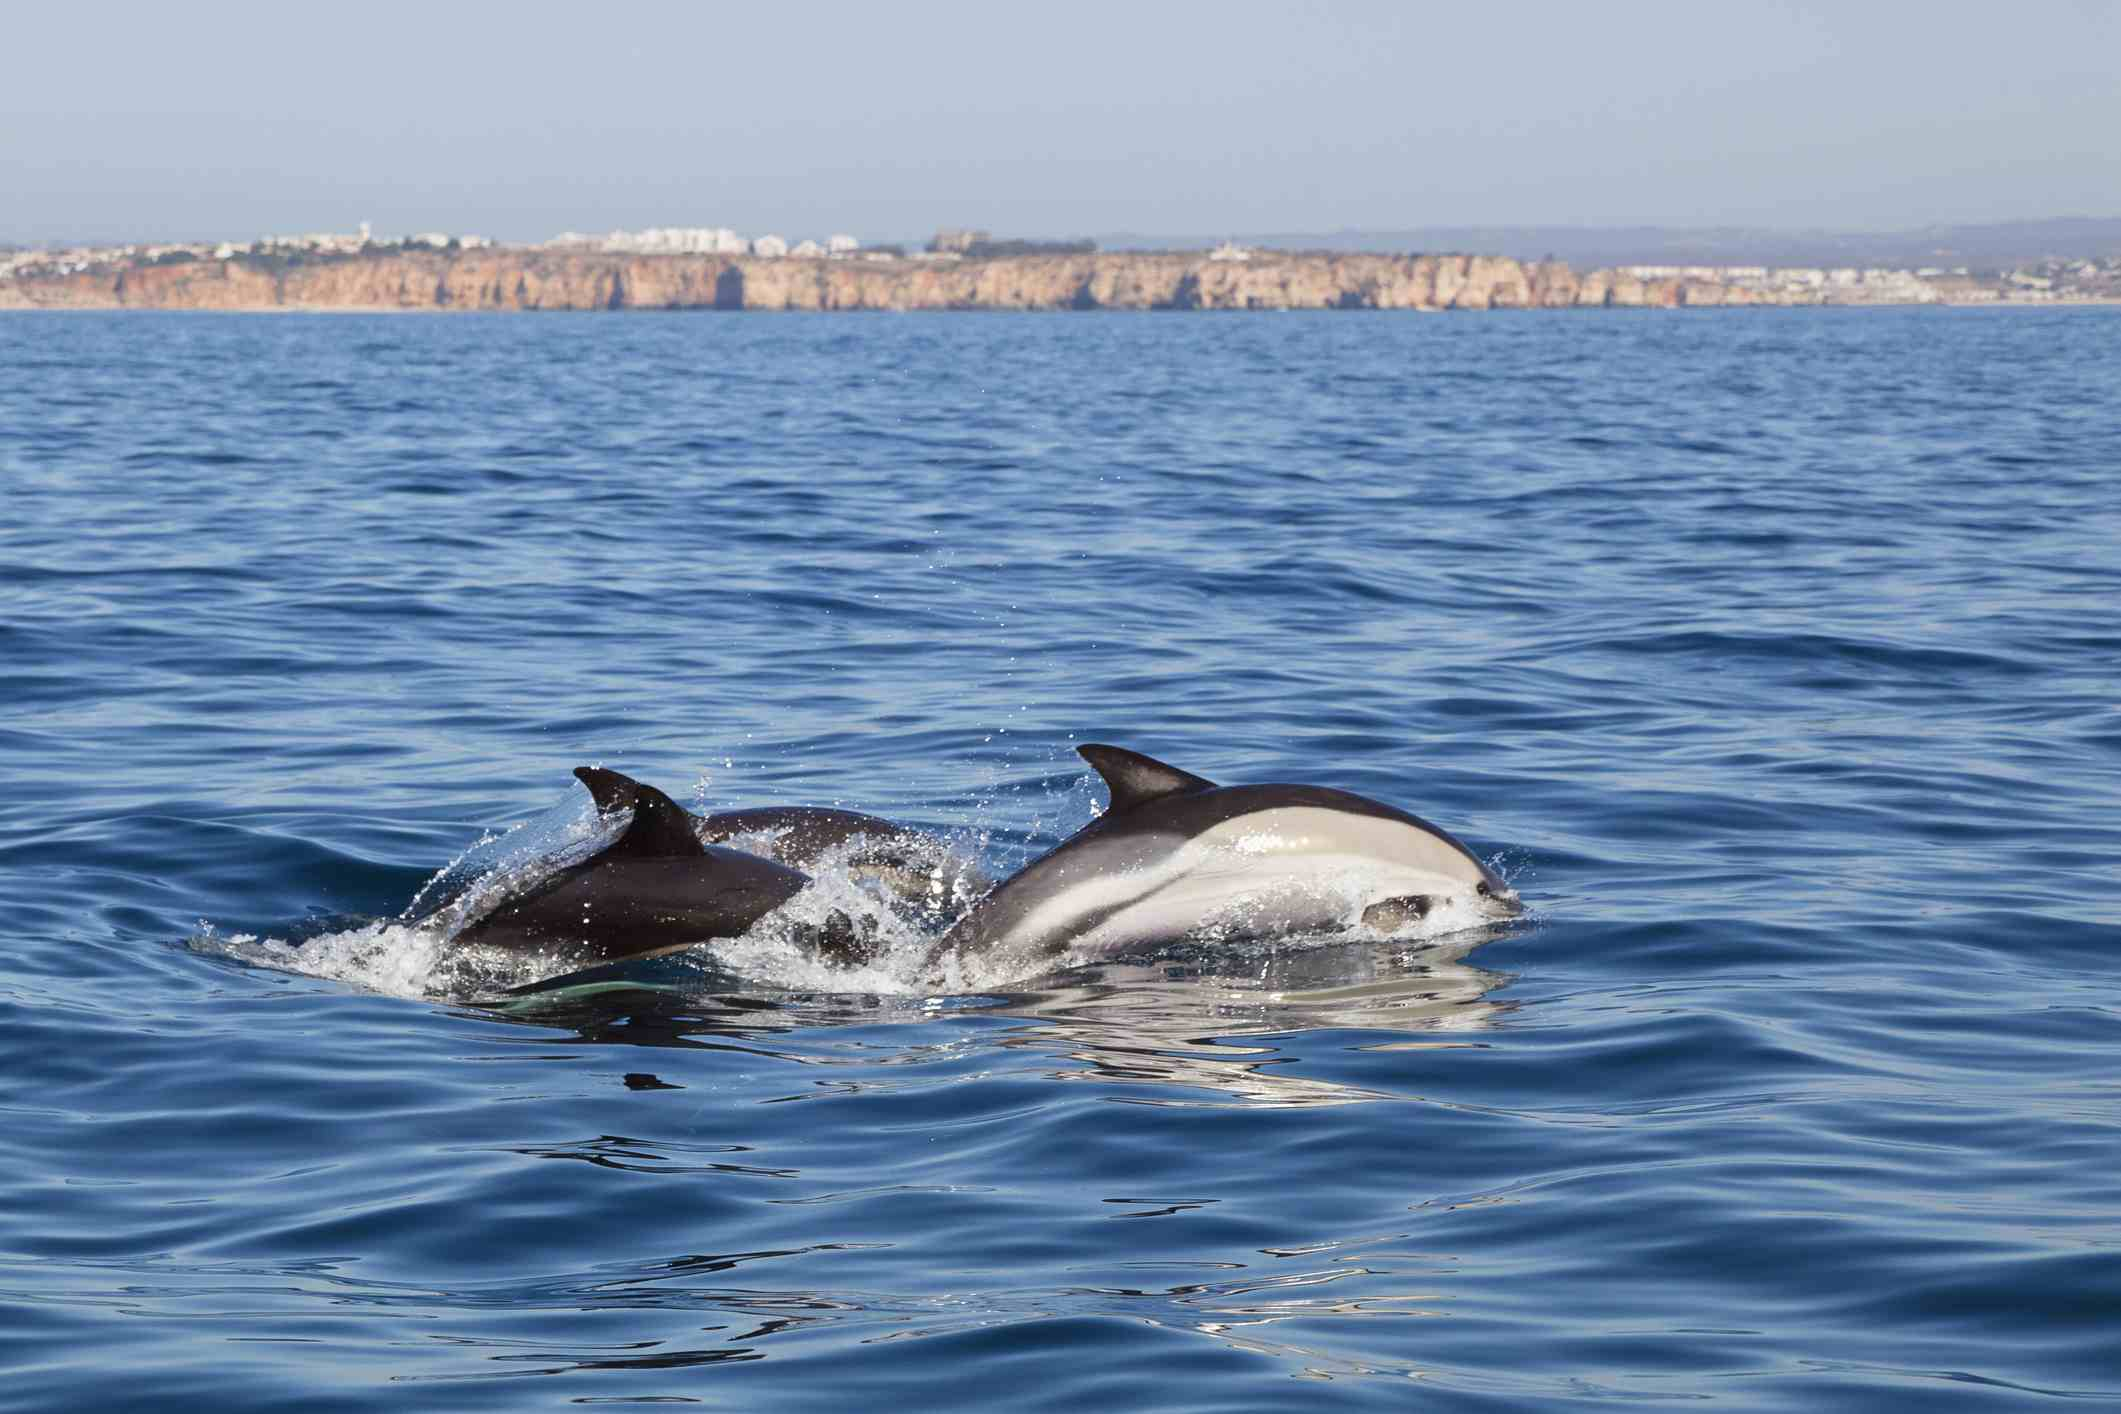 'Common Dolphins in the Atlantic Ocean off the Algarve Coast, Portugal'